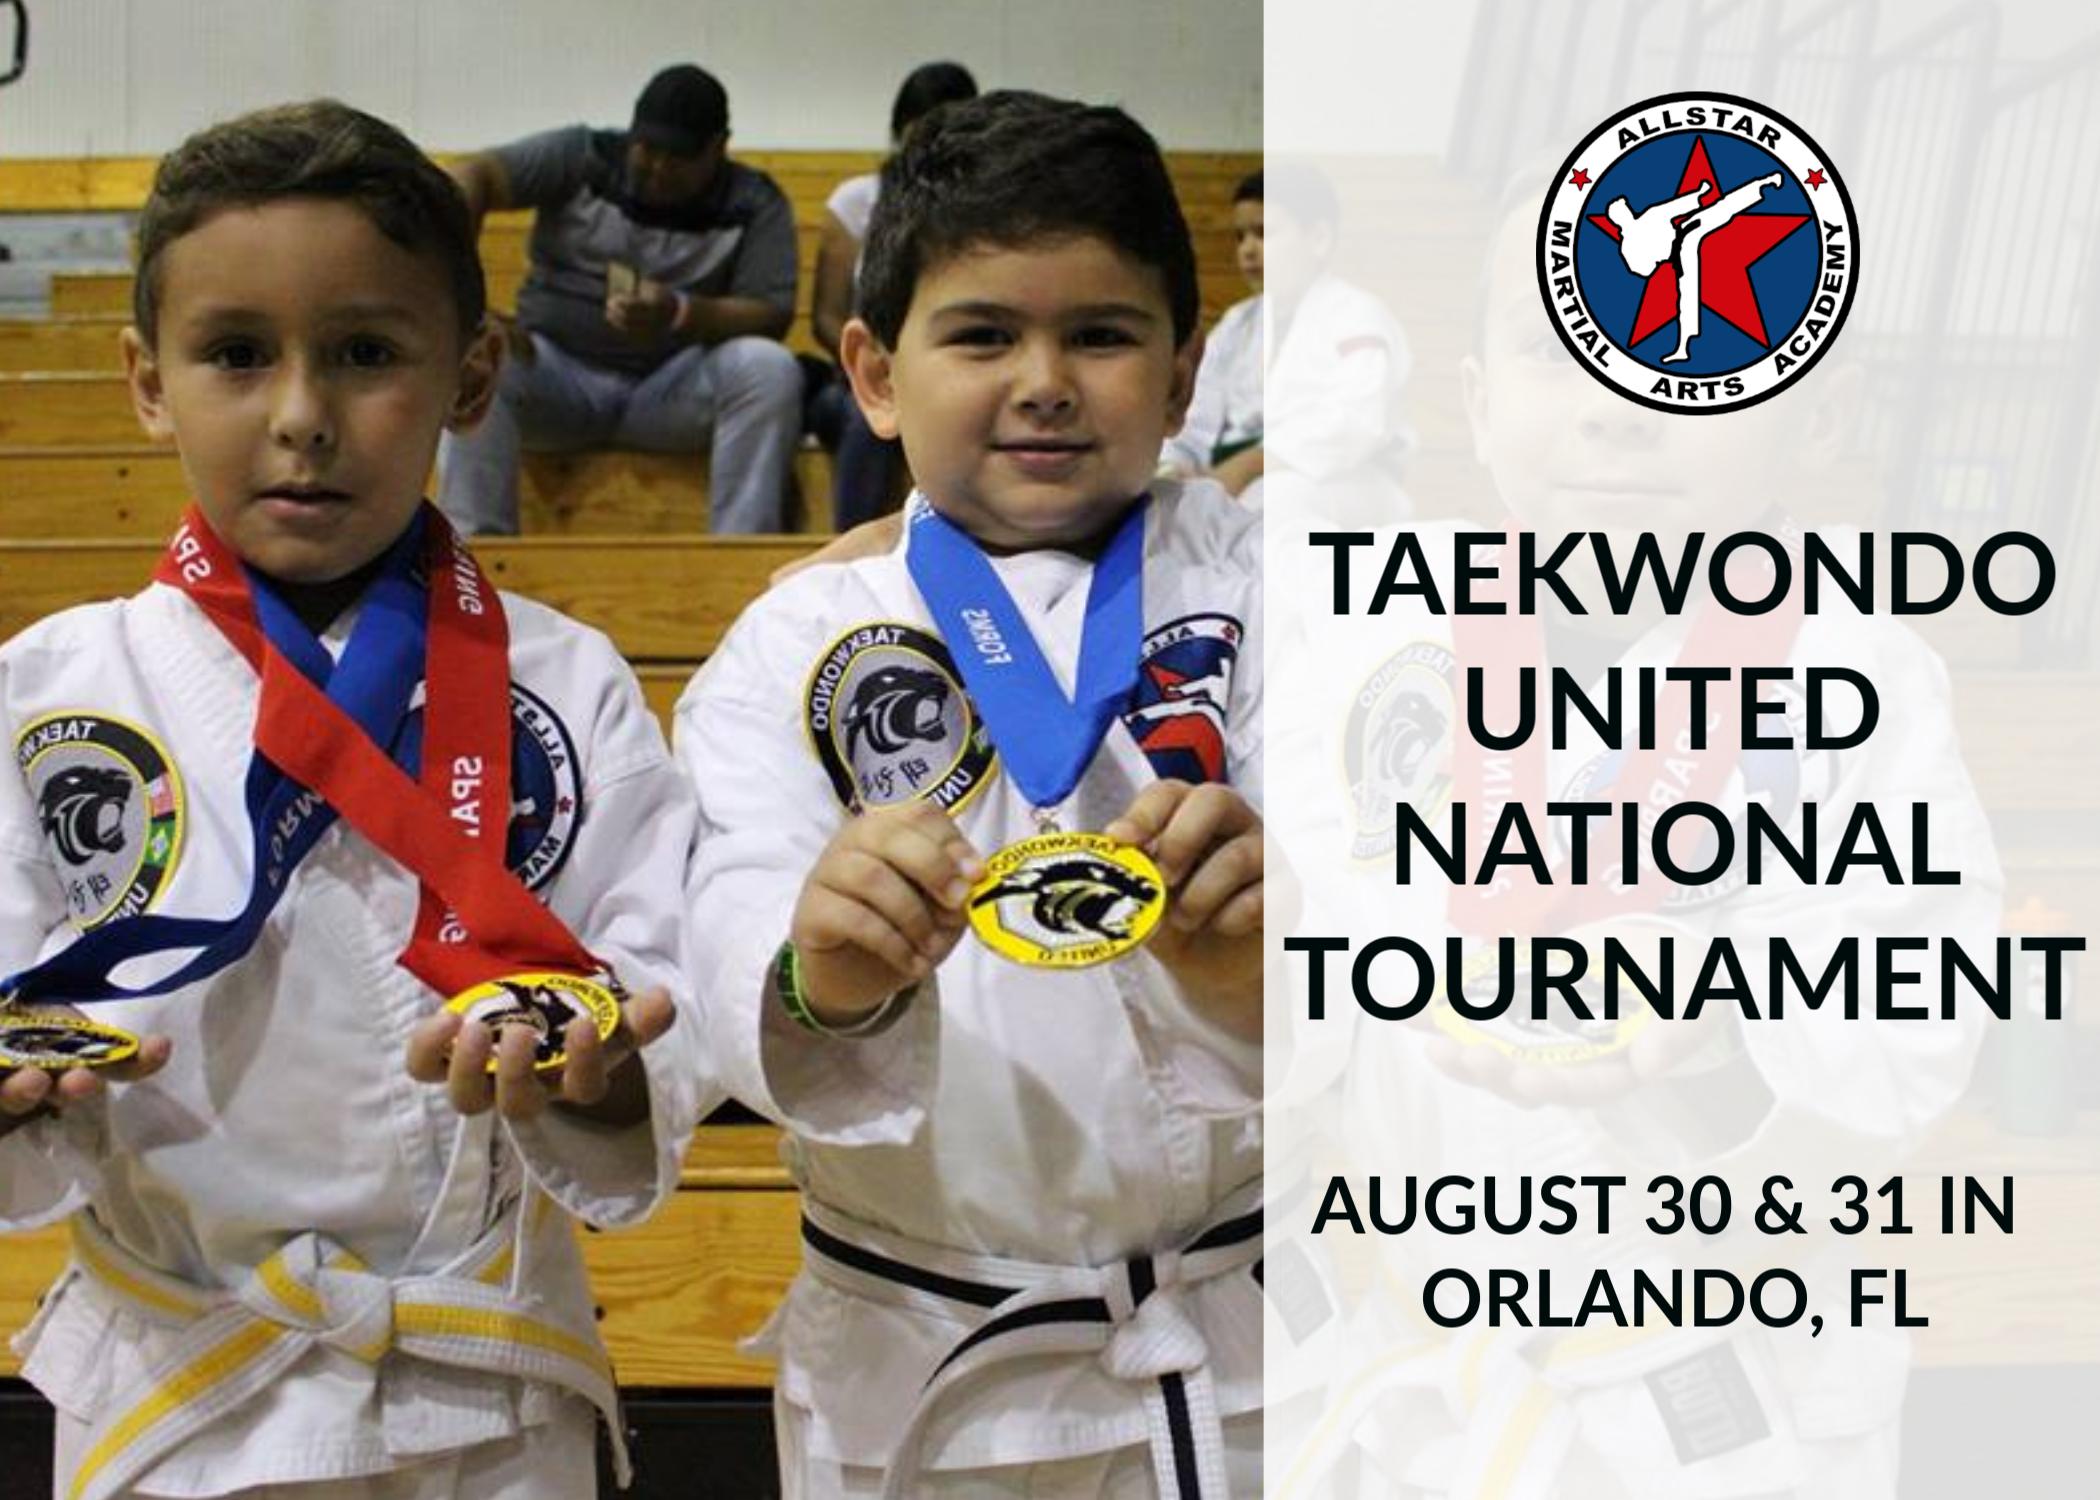 Tournament | Allstar Martial Arts Academy